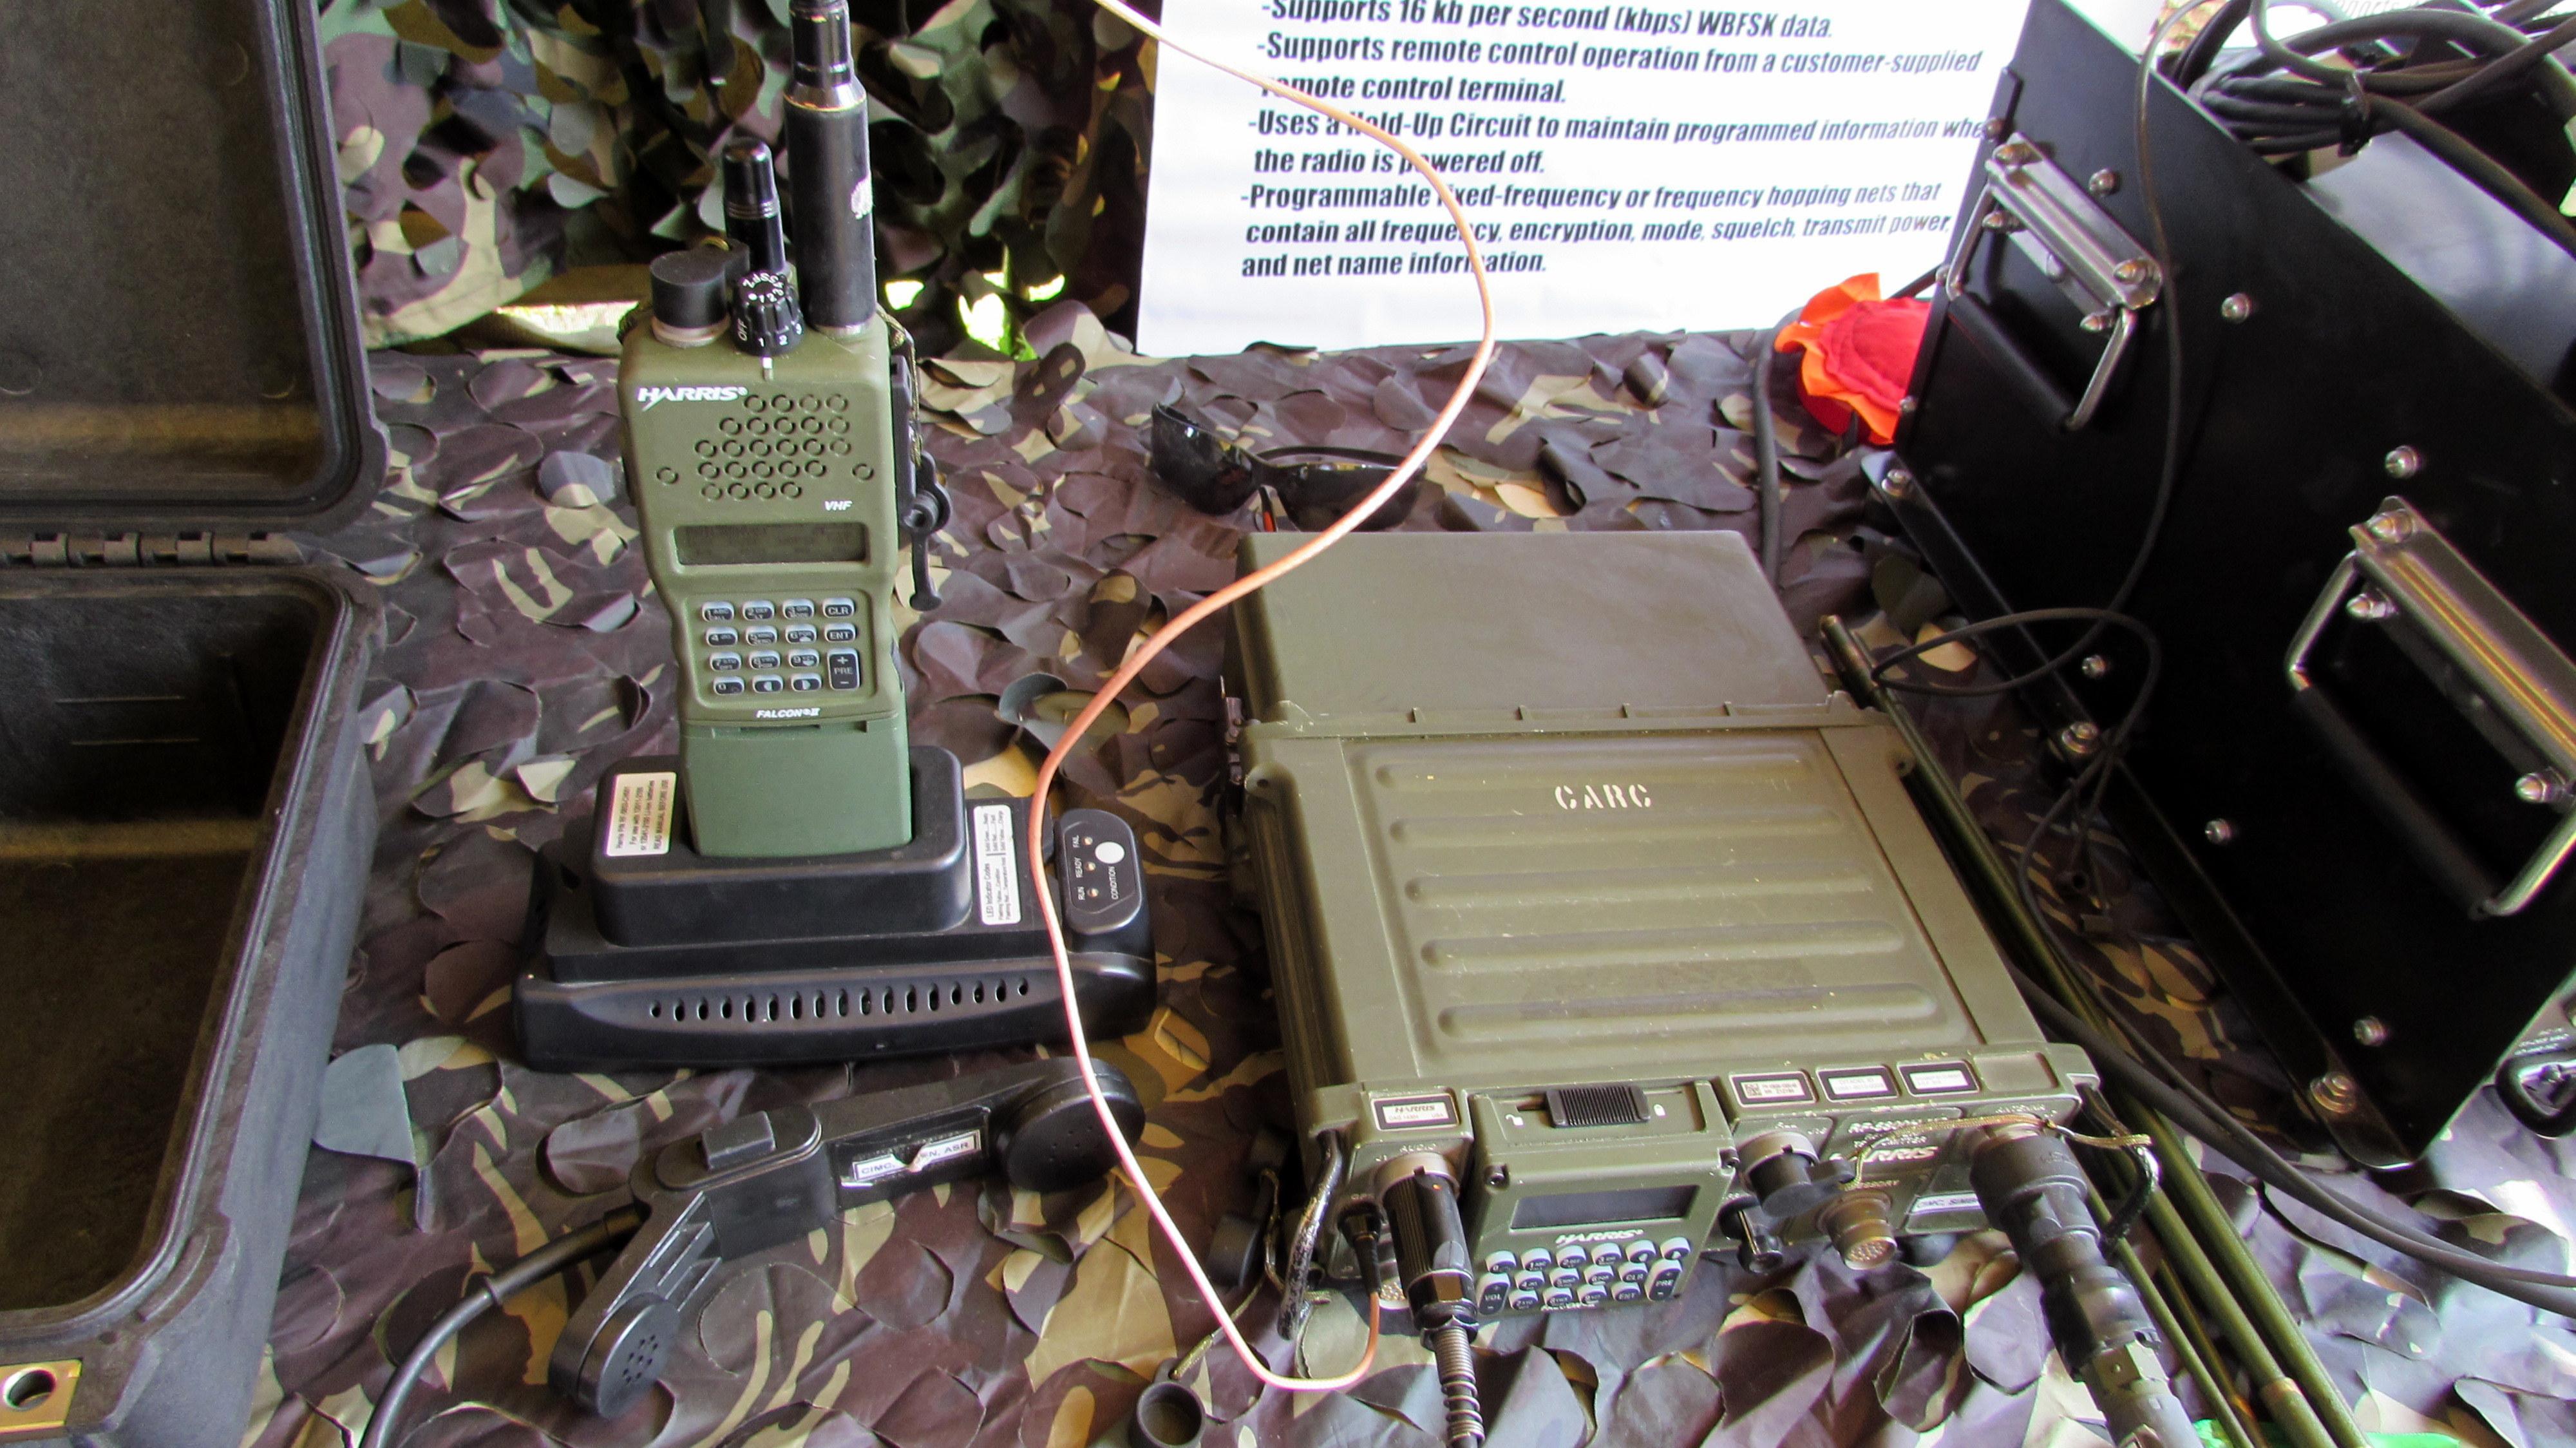 File:Harris RV-5800H-MP Man-Pack Radio jpg - Wikimedia Commons